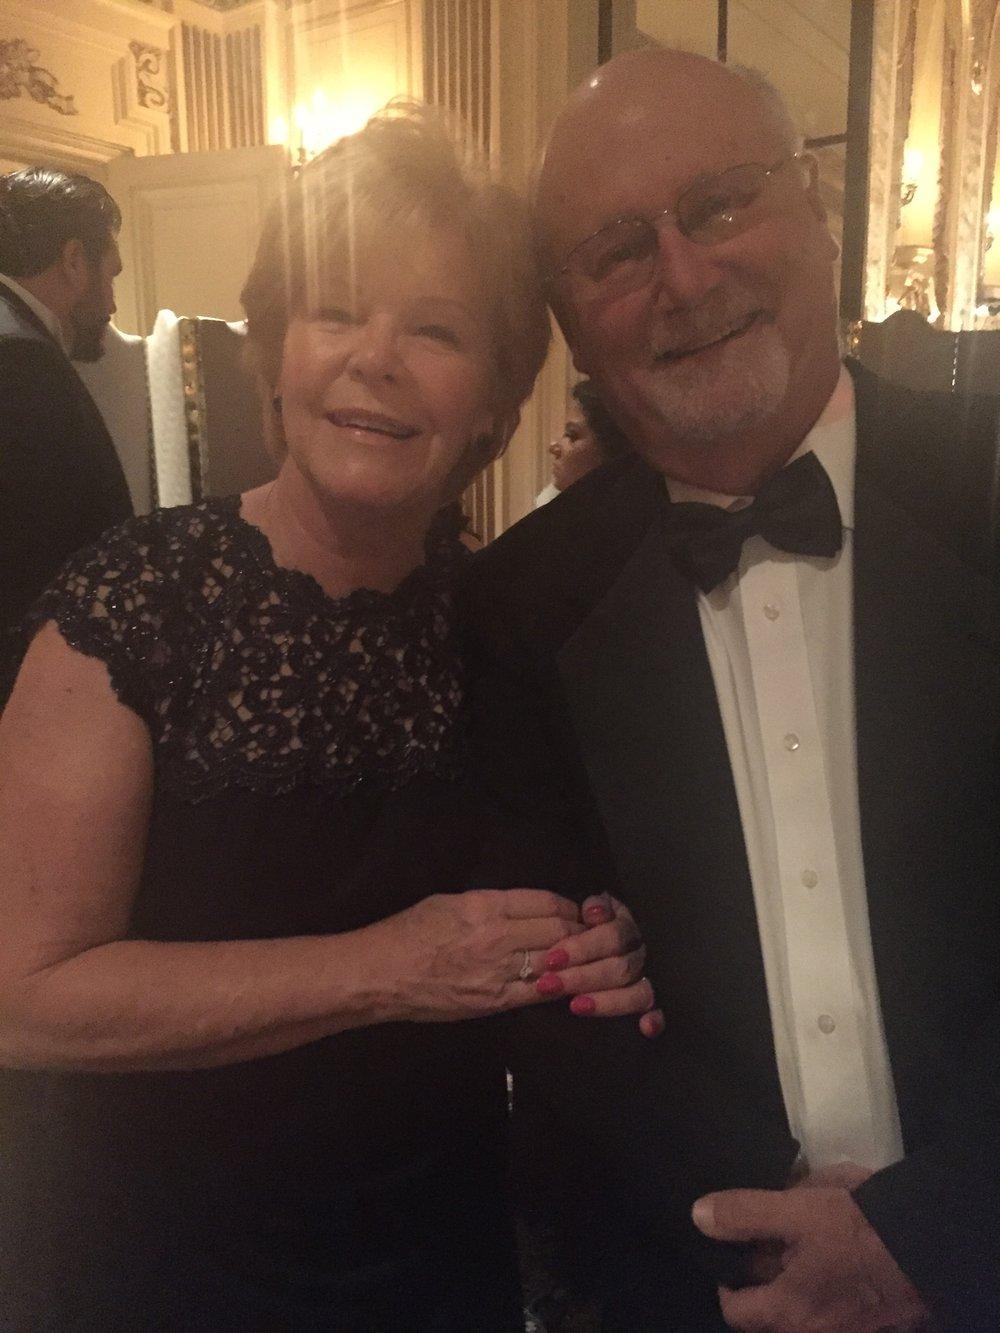 Linda and dan Killi, parents of co-founder/executive director, Jennifer marshall